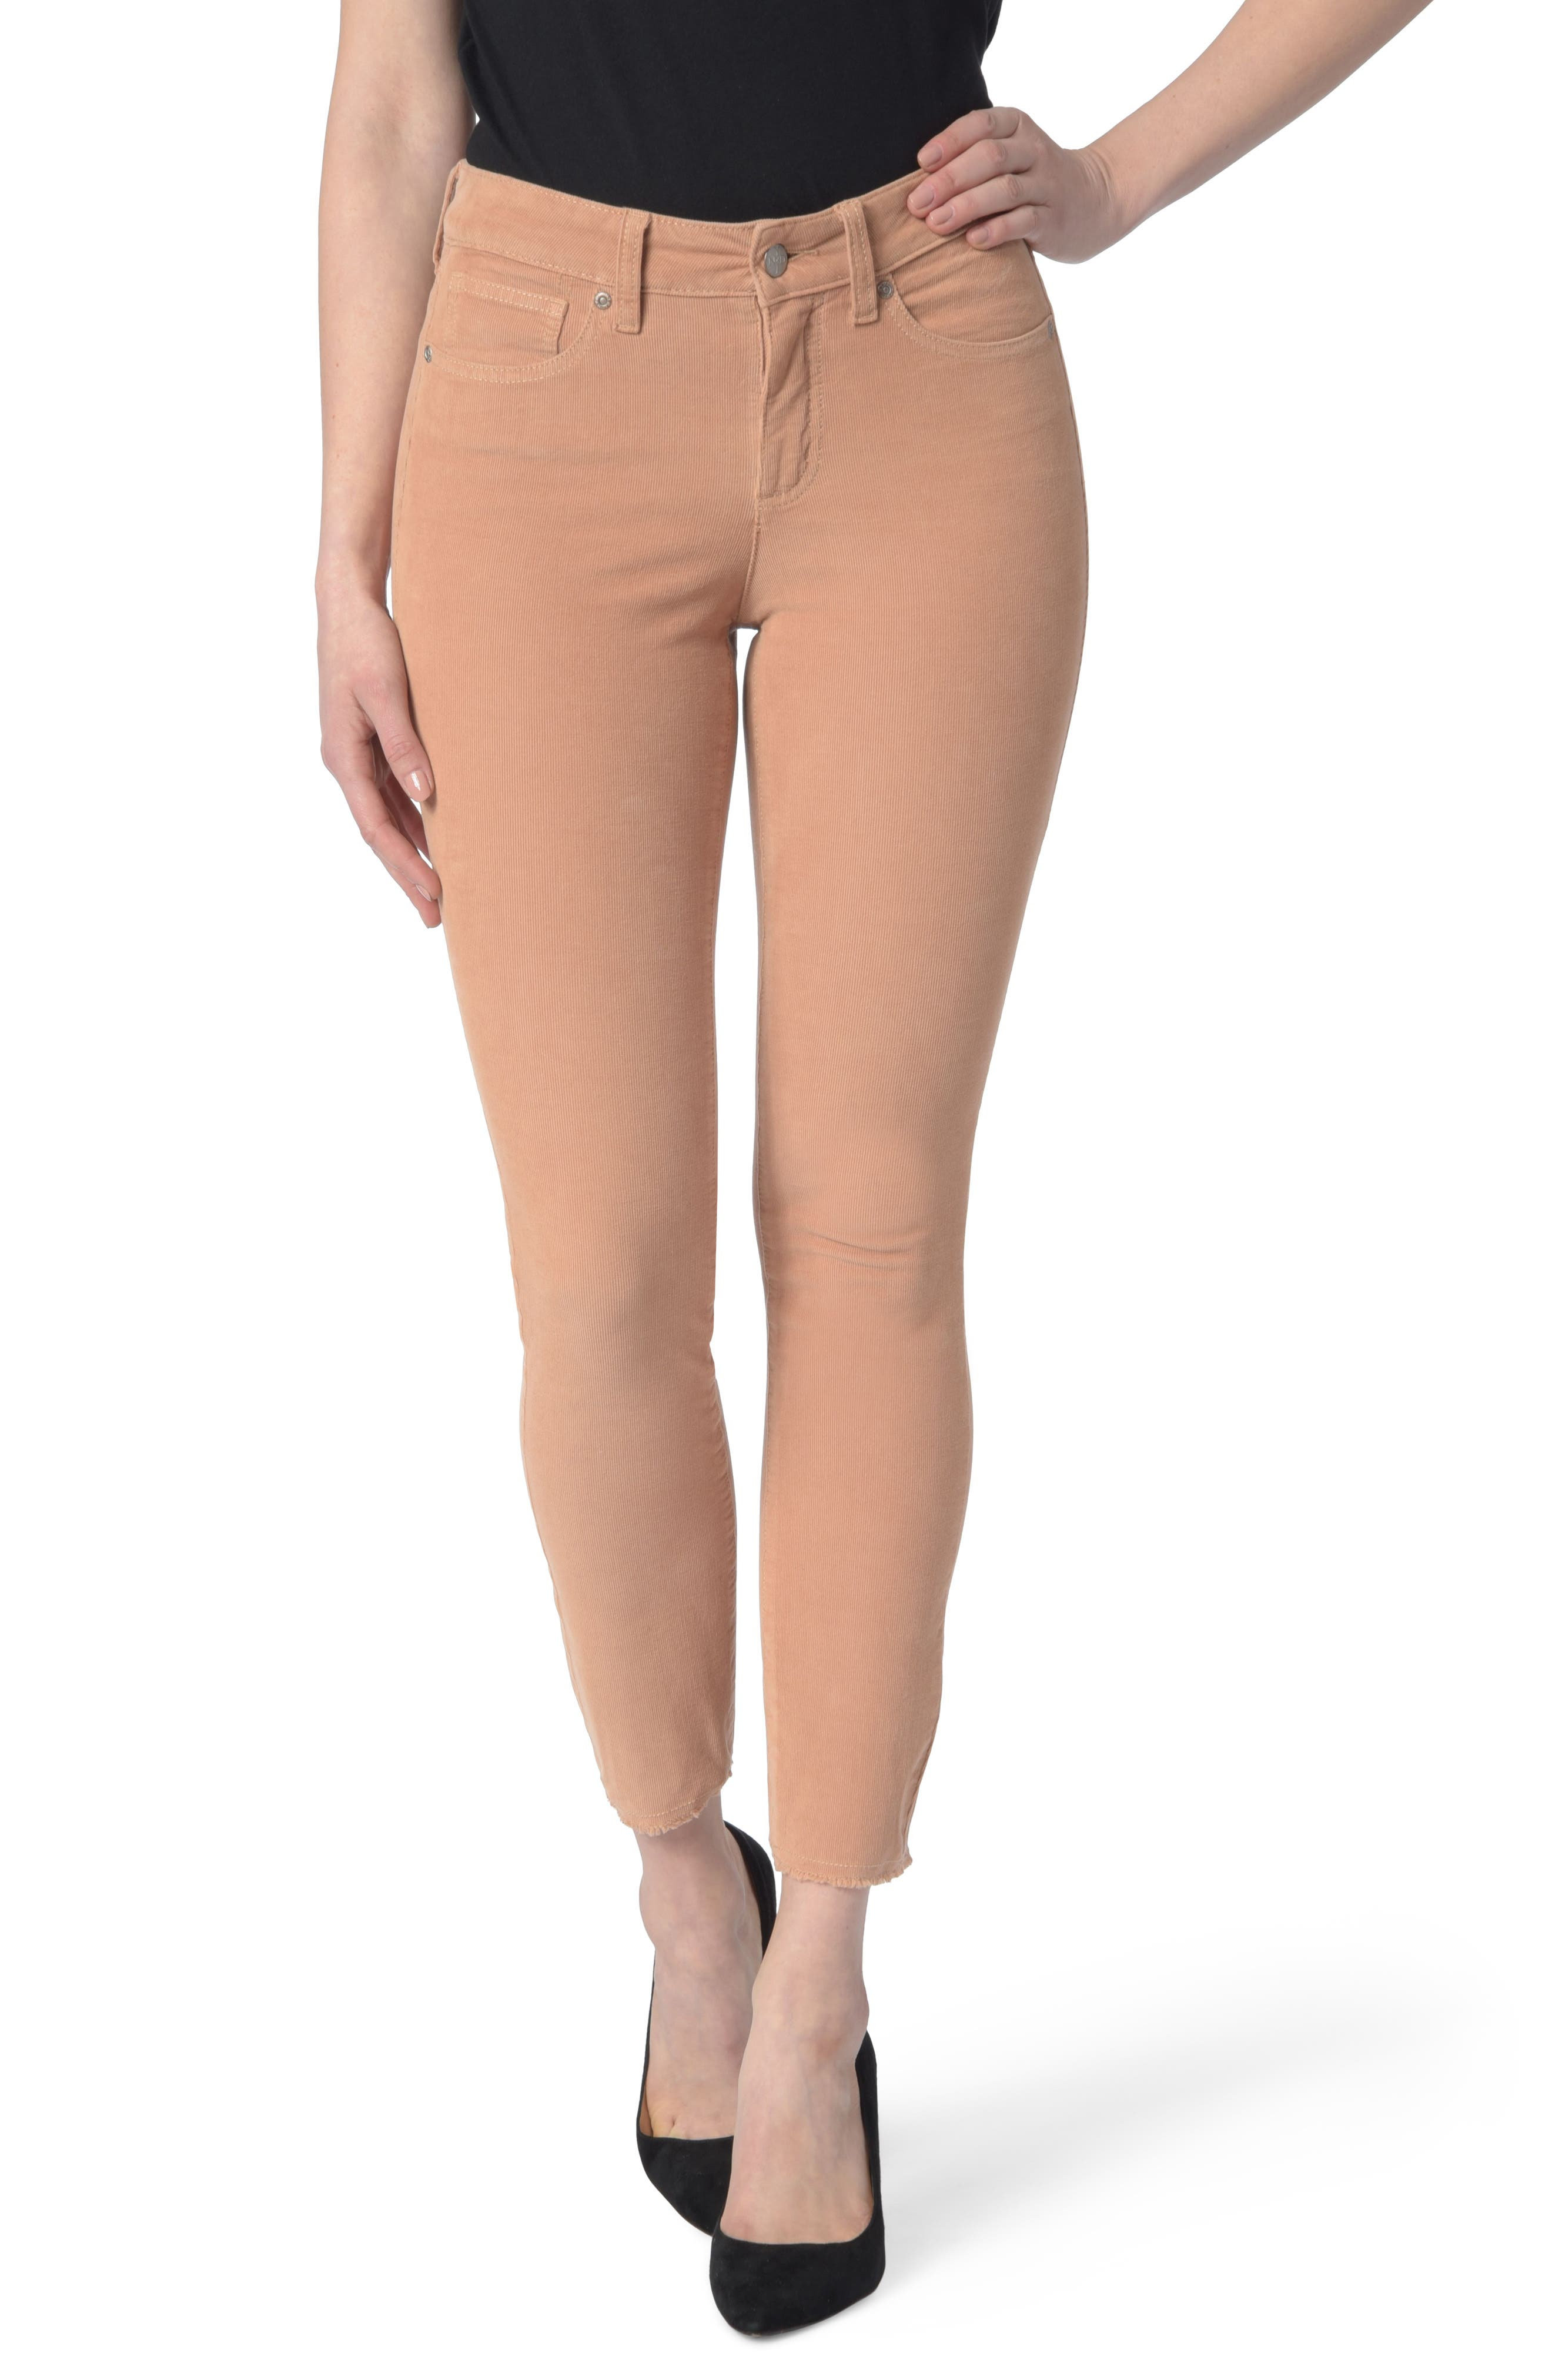 NYDJ Alina Frayed Stretch Corduroy Ankle Jeans